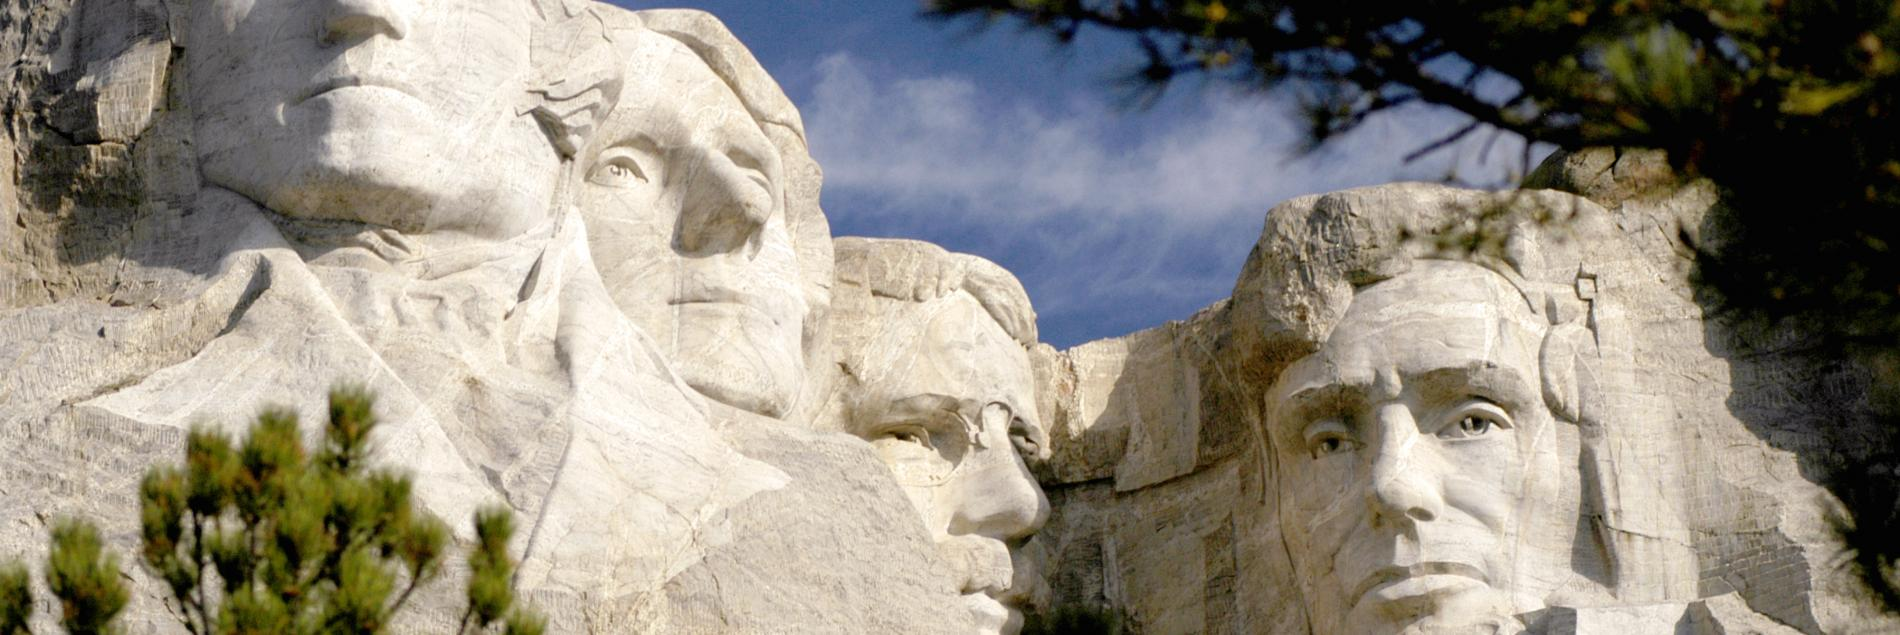 Ranger-led Programs at Mount Rushmore National Memorial